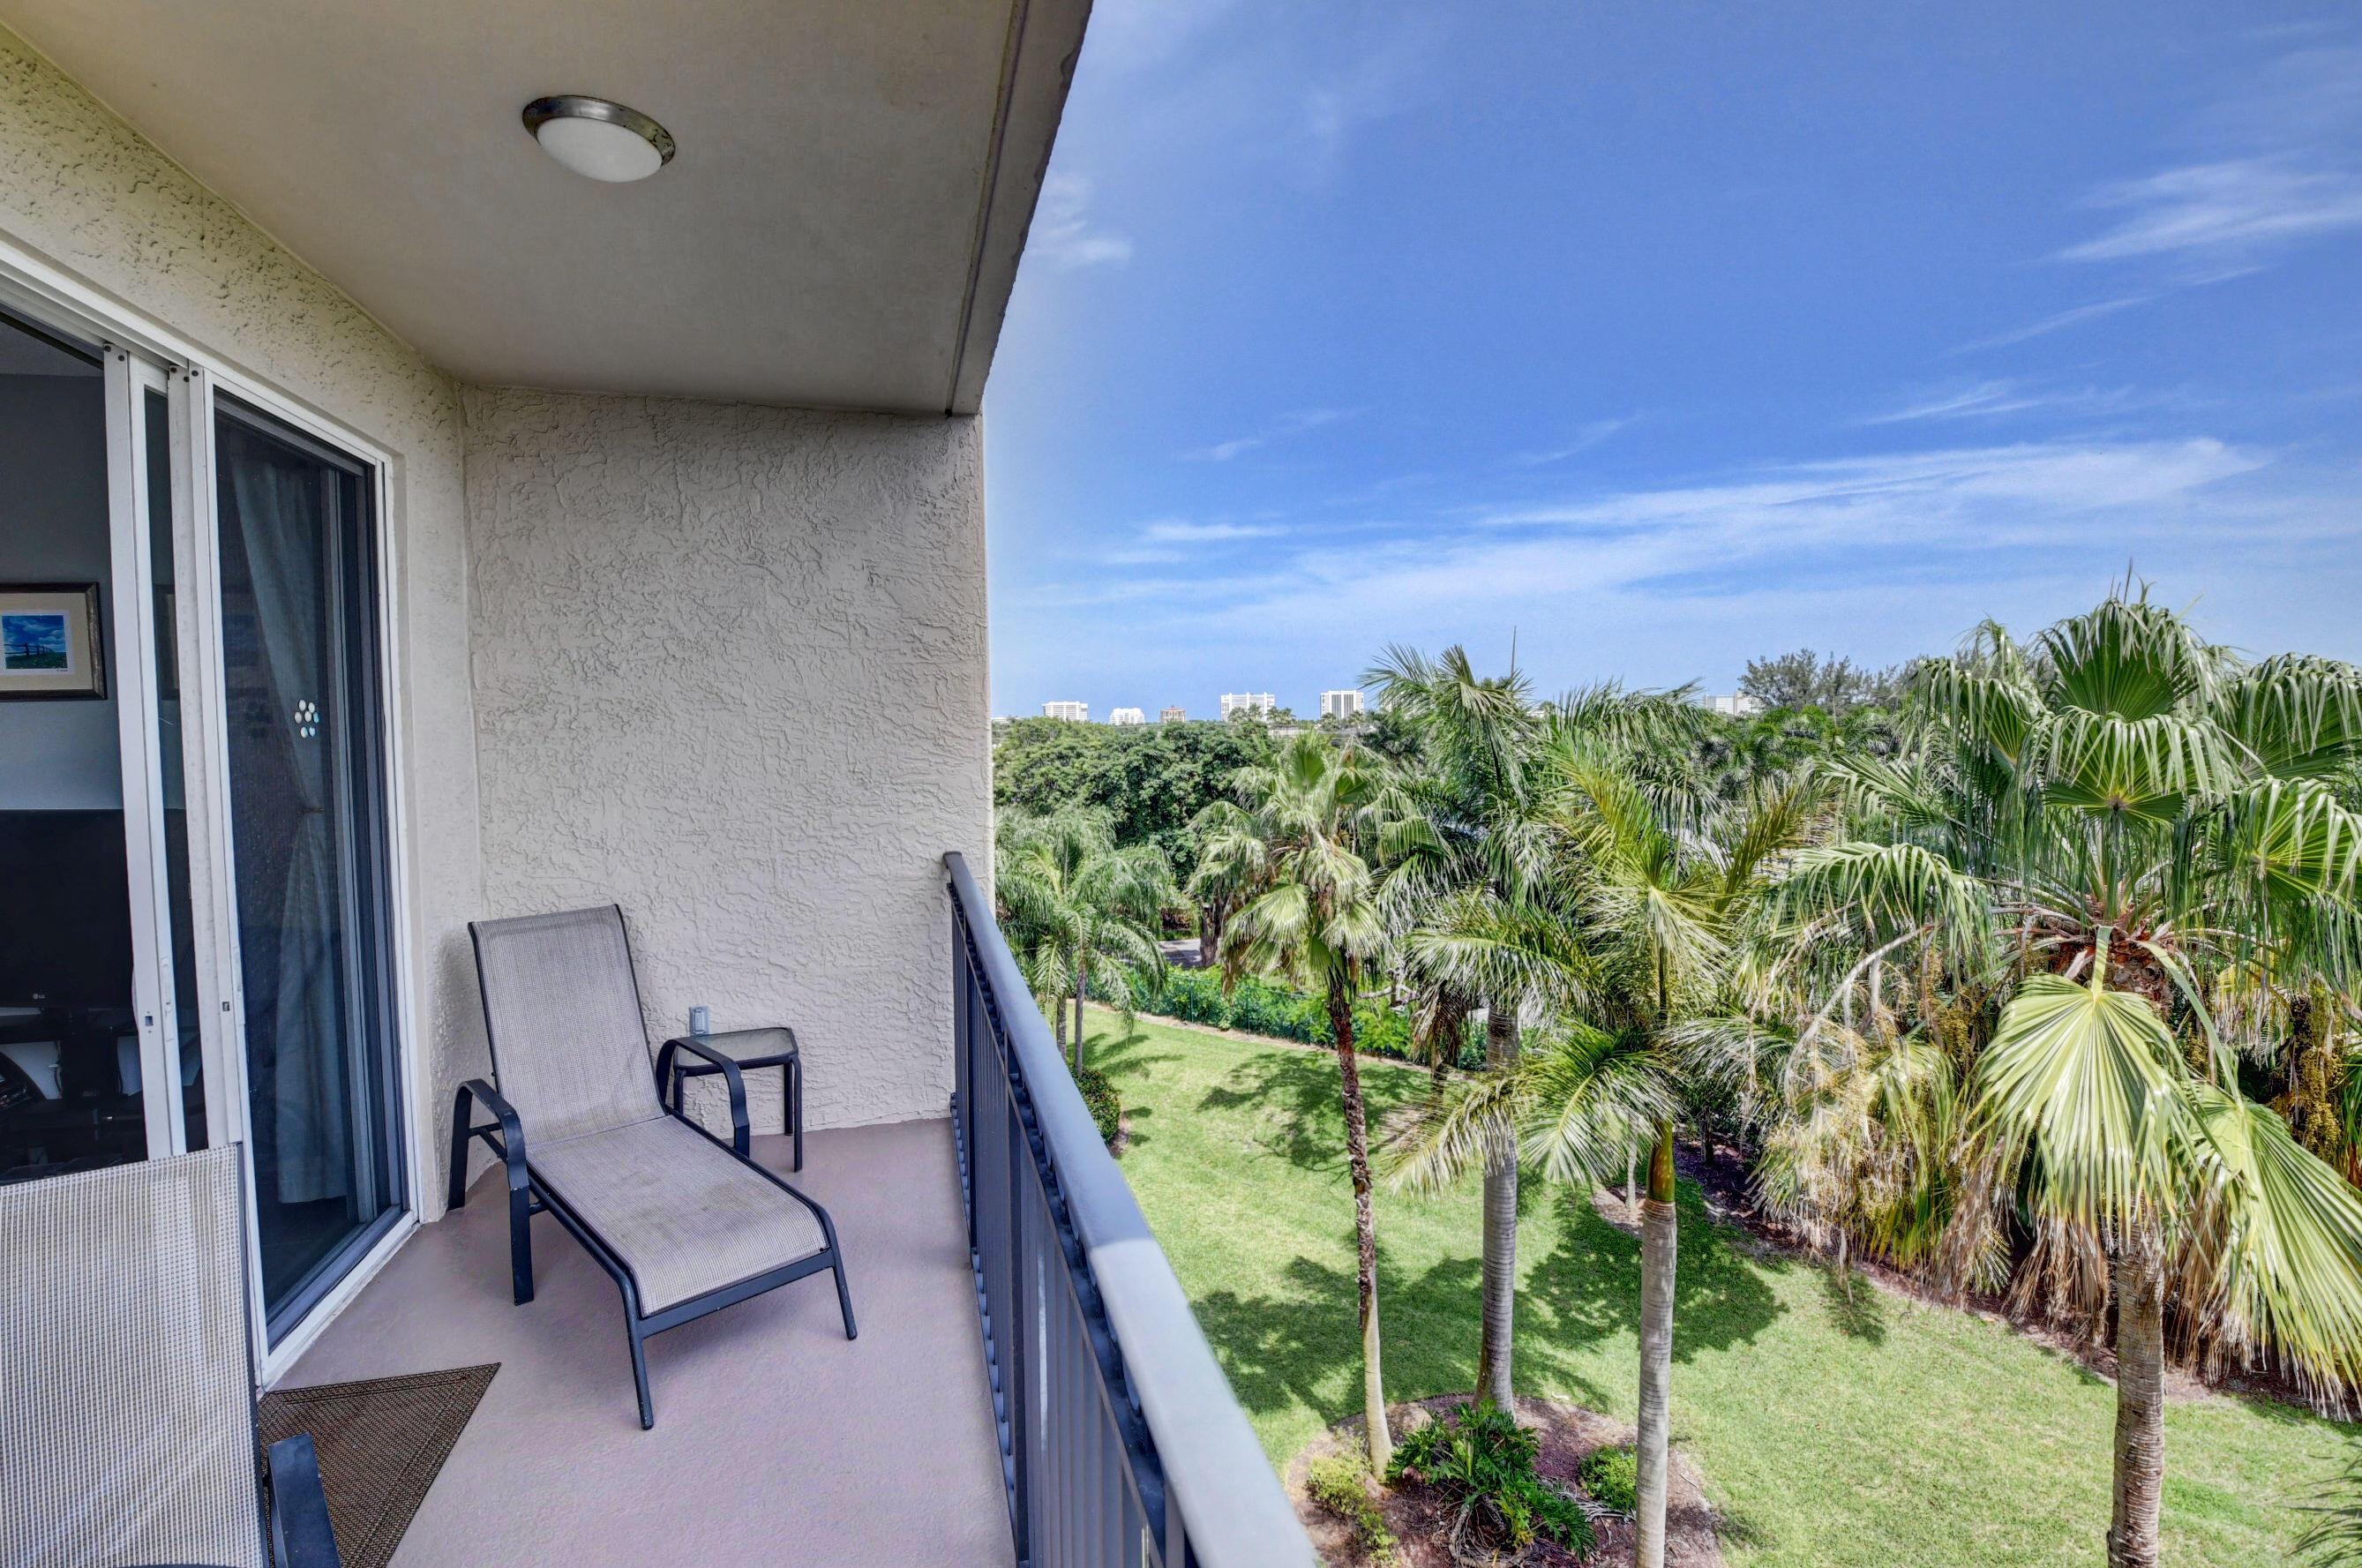 26 Royal Palm Way 506, Boca Raton, Florida 33432, 2 Bedrooms Bedrooms, ,2 BathroomsBathrooms,A,Condominium,Royal Palm,RX-10730989